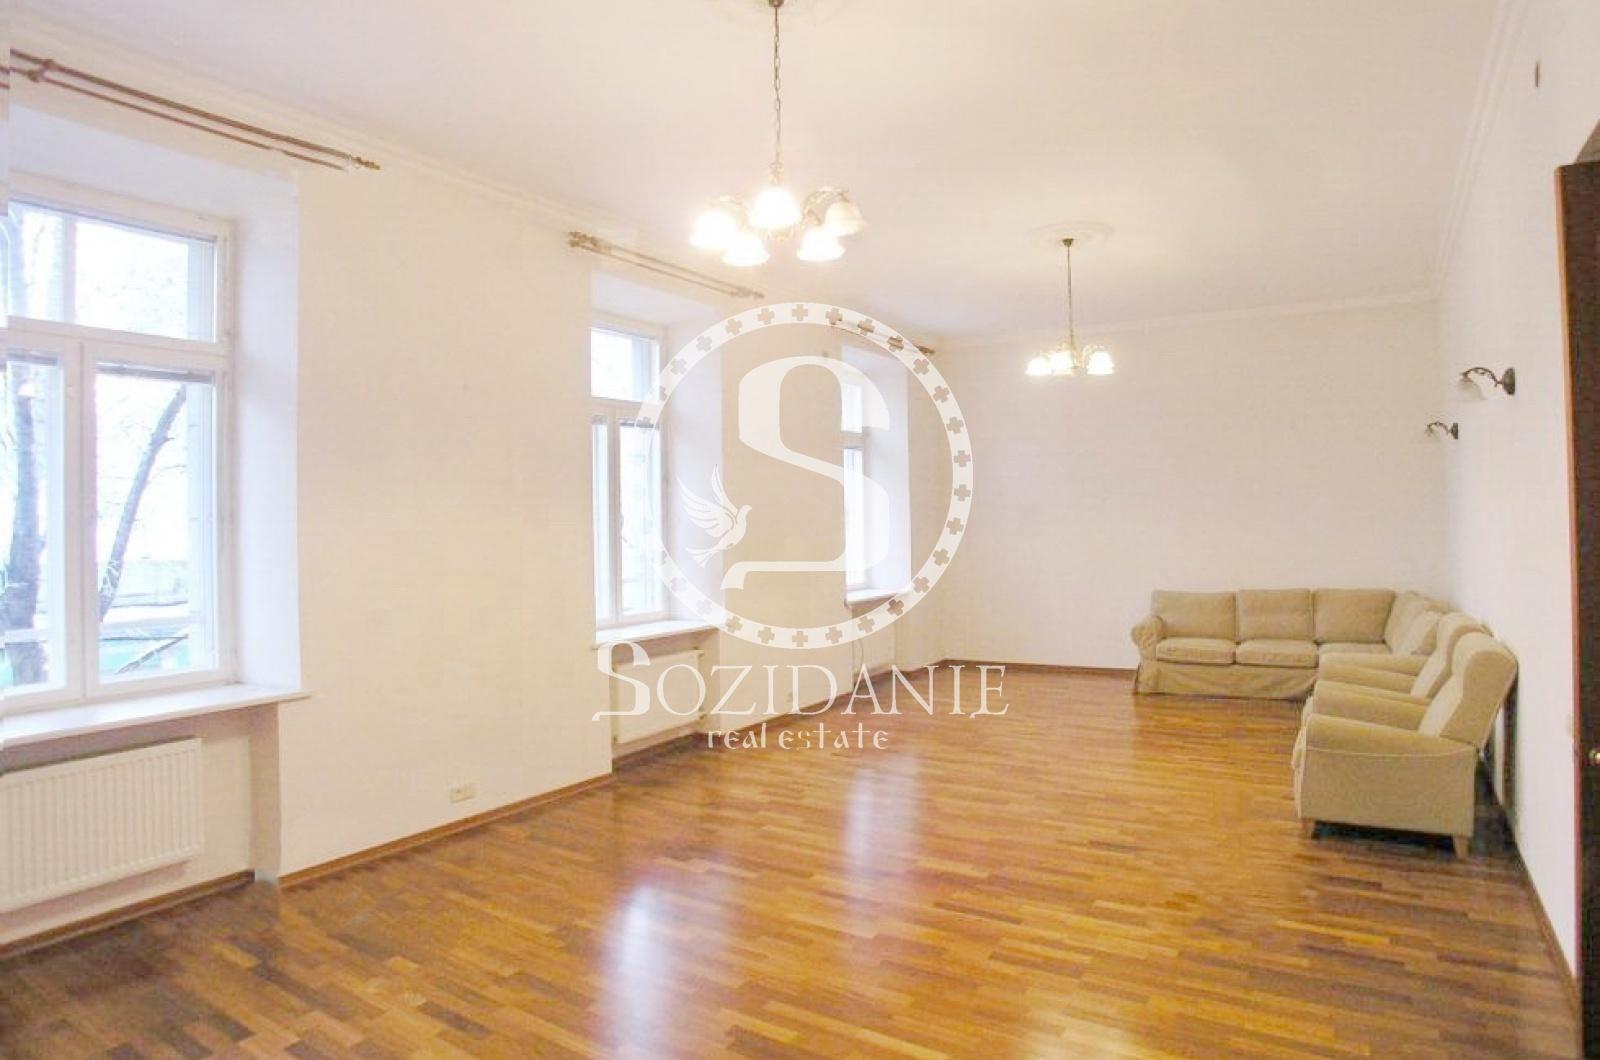 5 Комнаты, Городская, Аренда, Гагаринский переулок, Listing ID 3567, Москва, Россия,